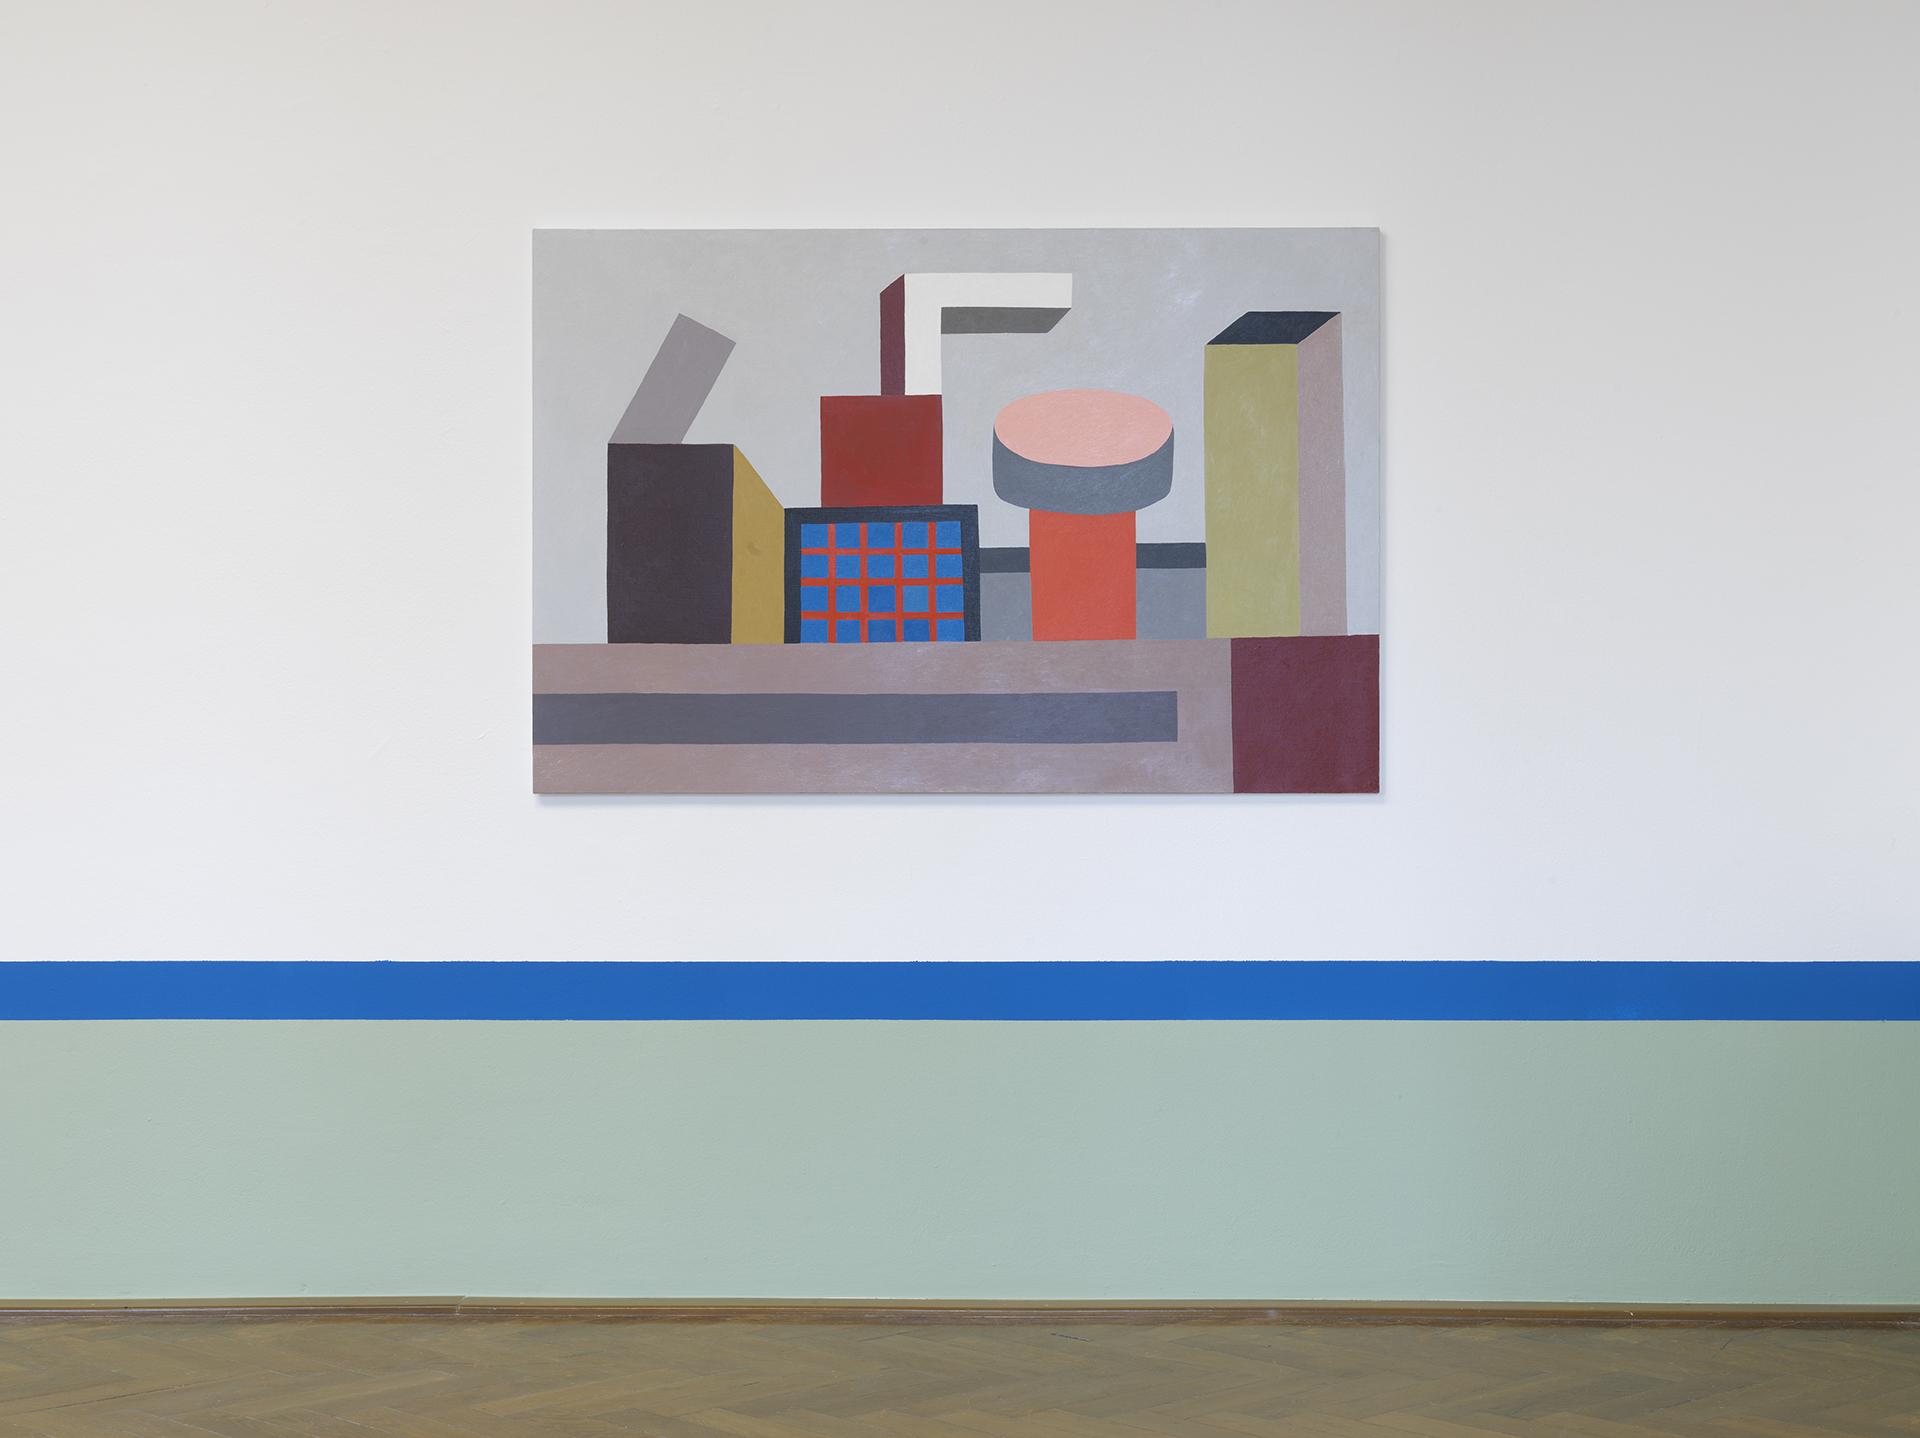 Nathalie Du Pasquier, FAIR GAME, Oil on Canvas 100x150, 2015